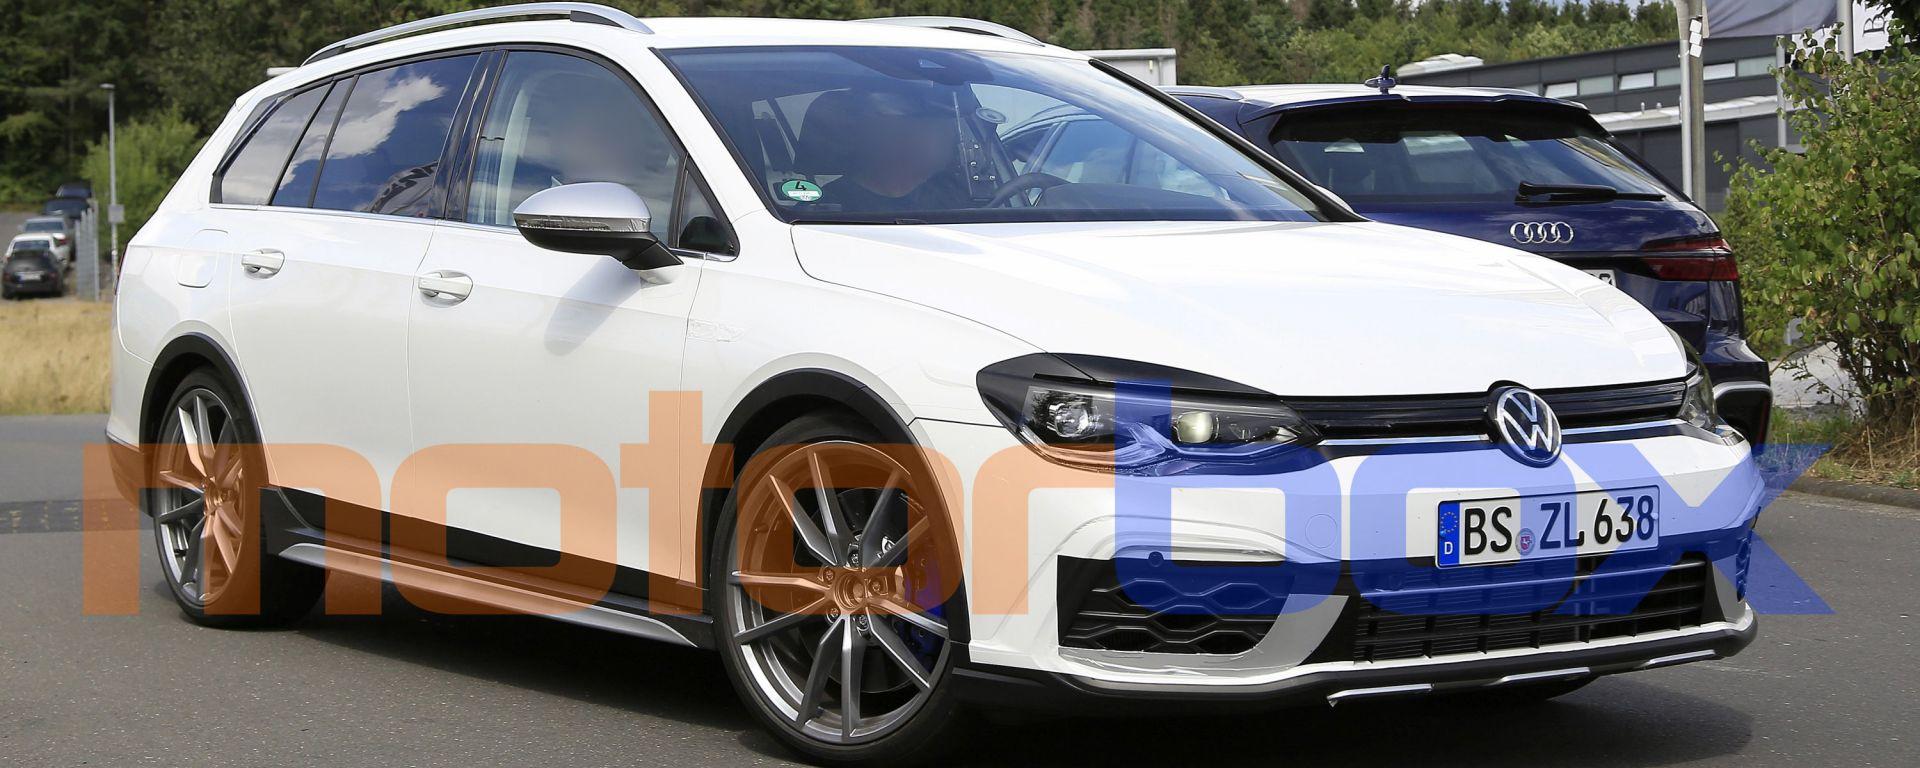 Volkswagen Golf R Variant 2021: le foto spia